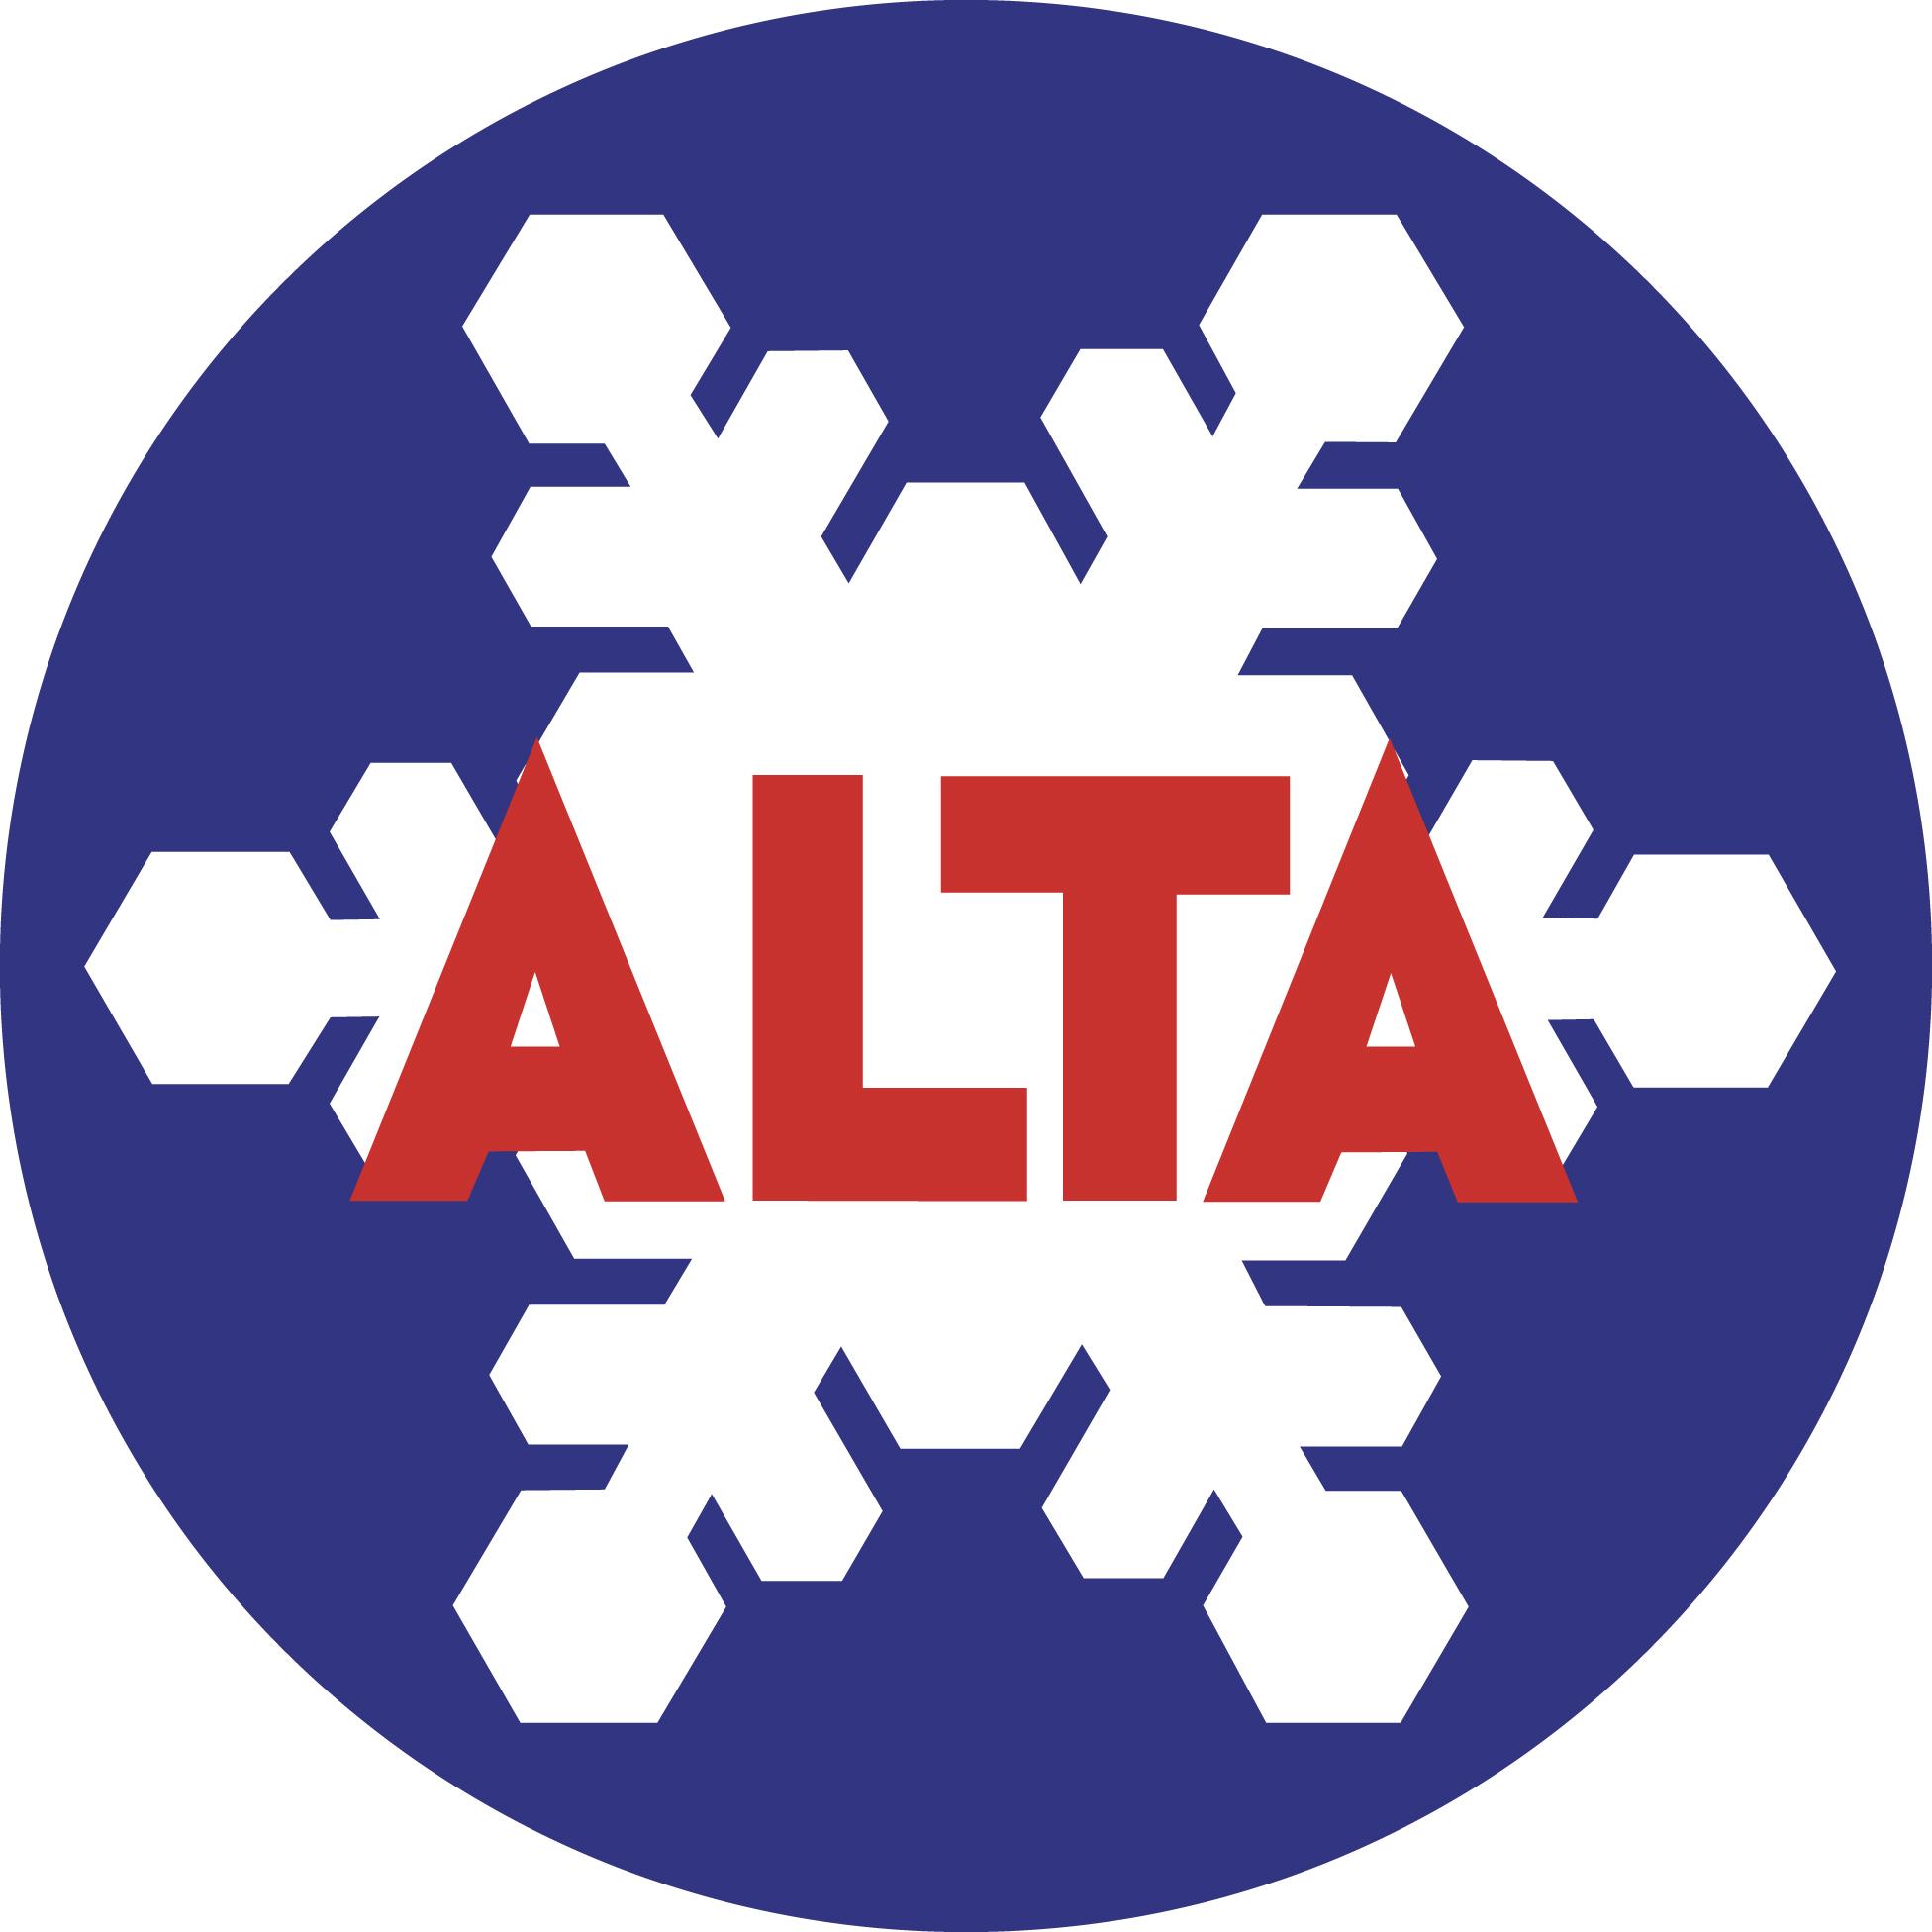 Alta.jpg